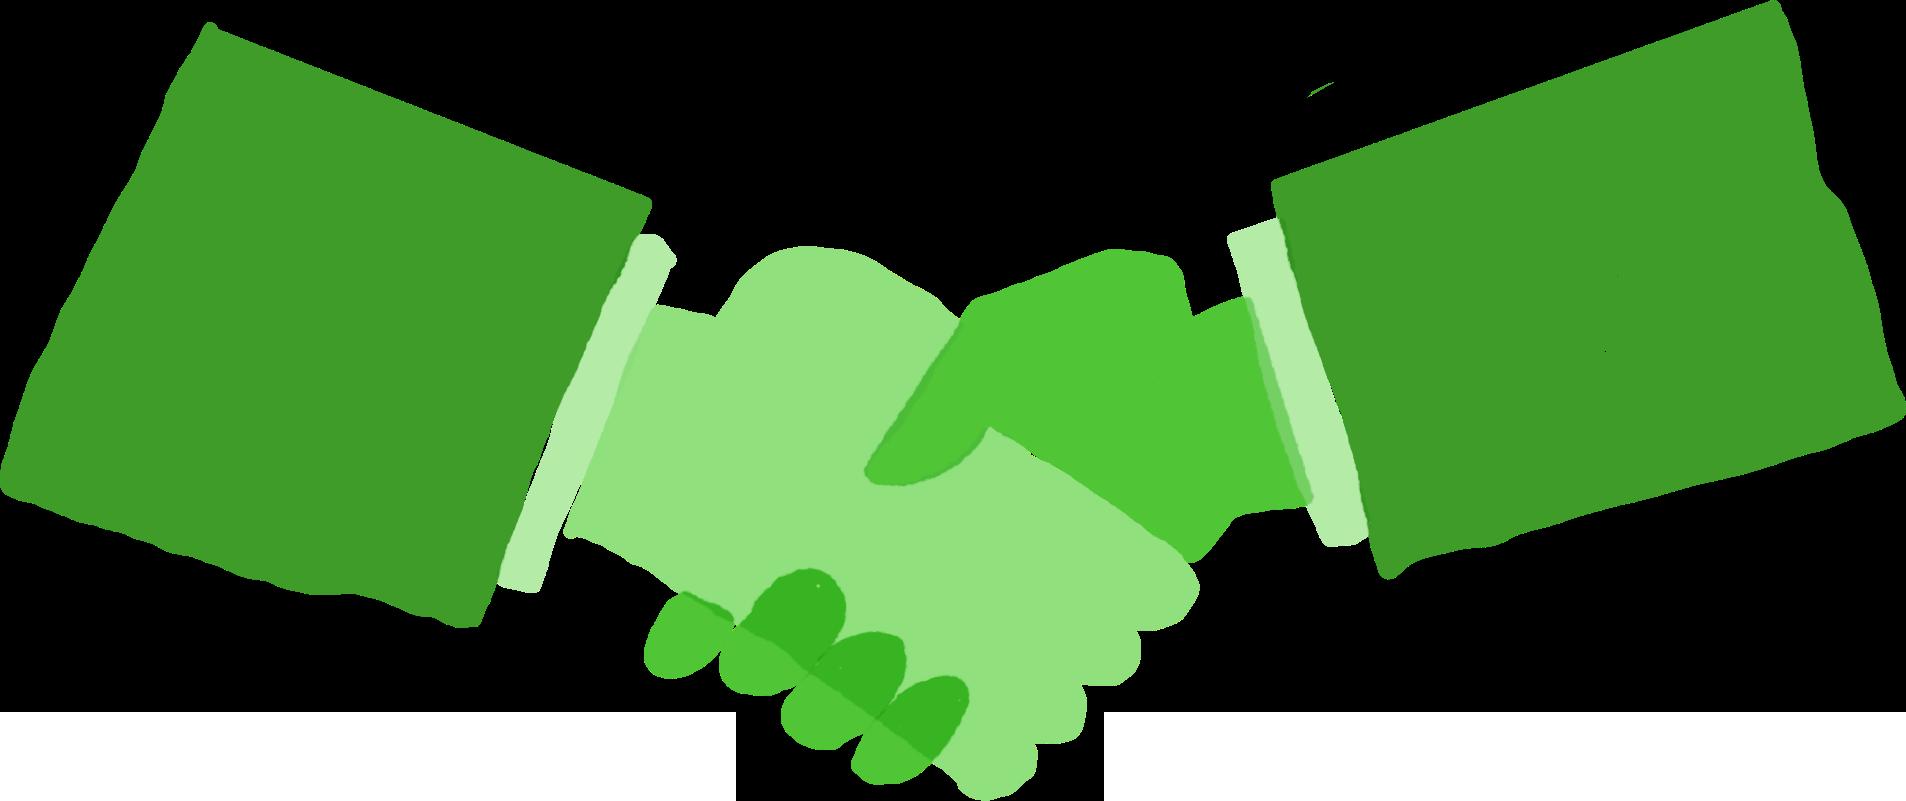 2 hands shaking illustration